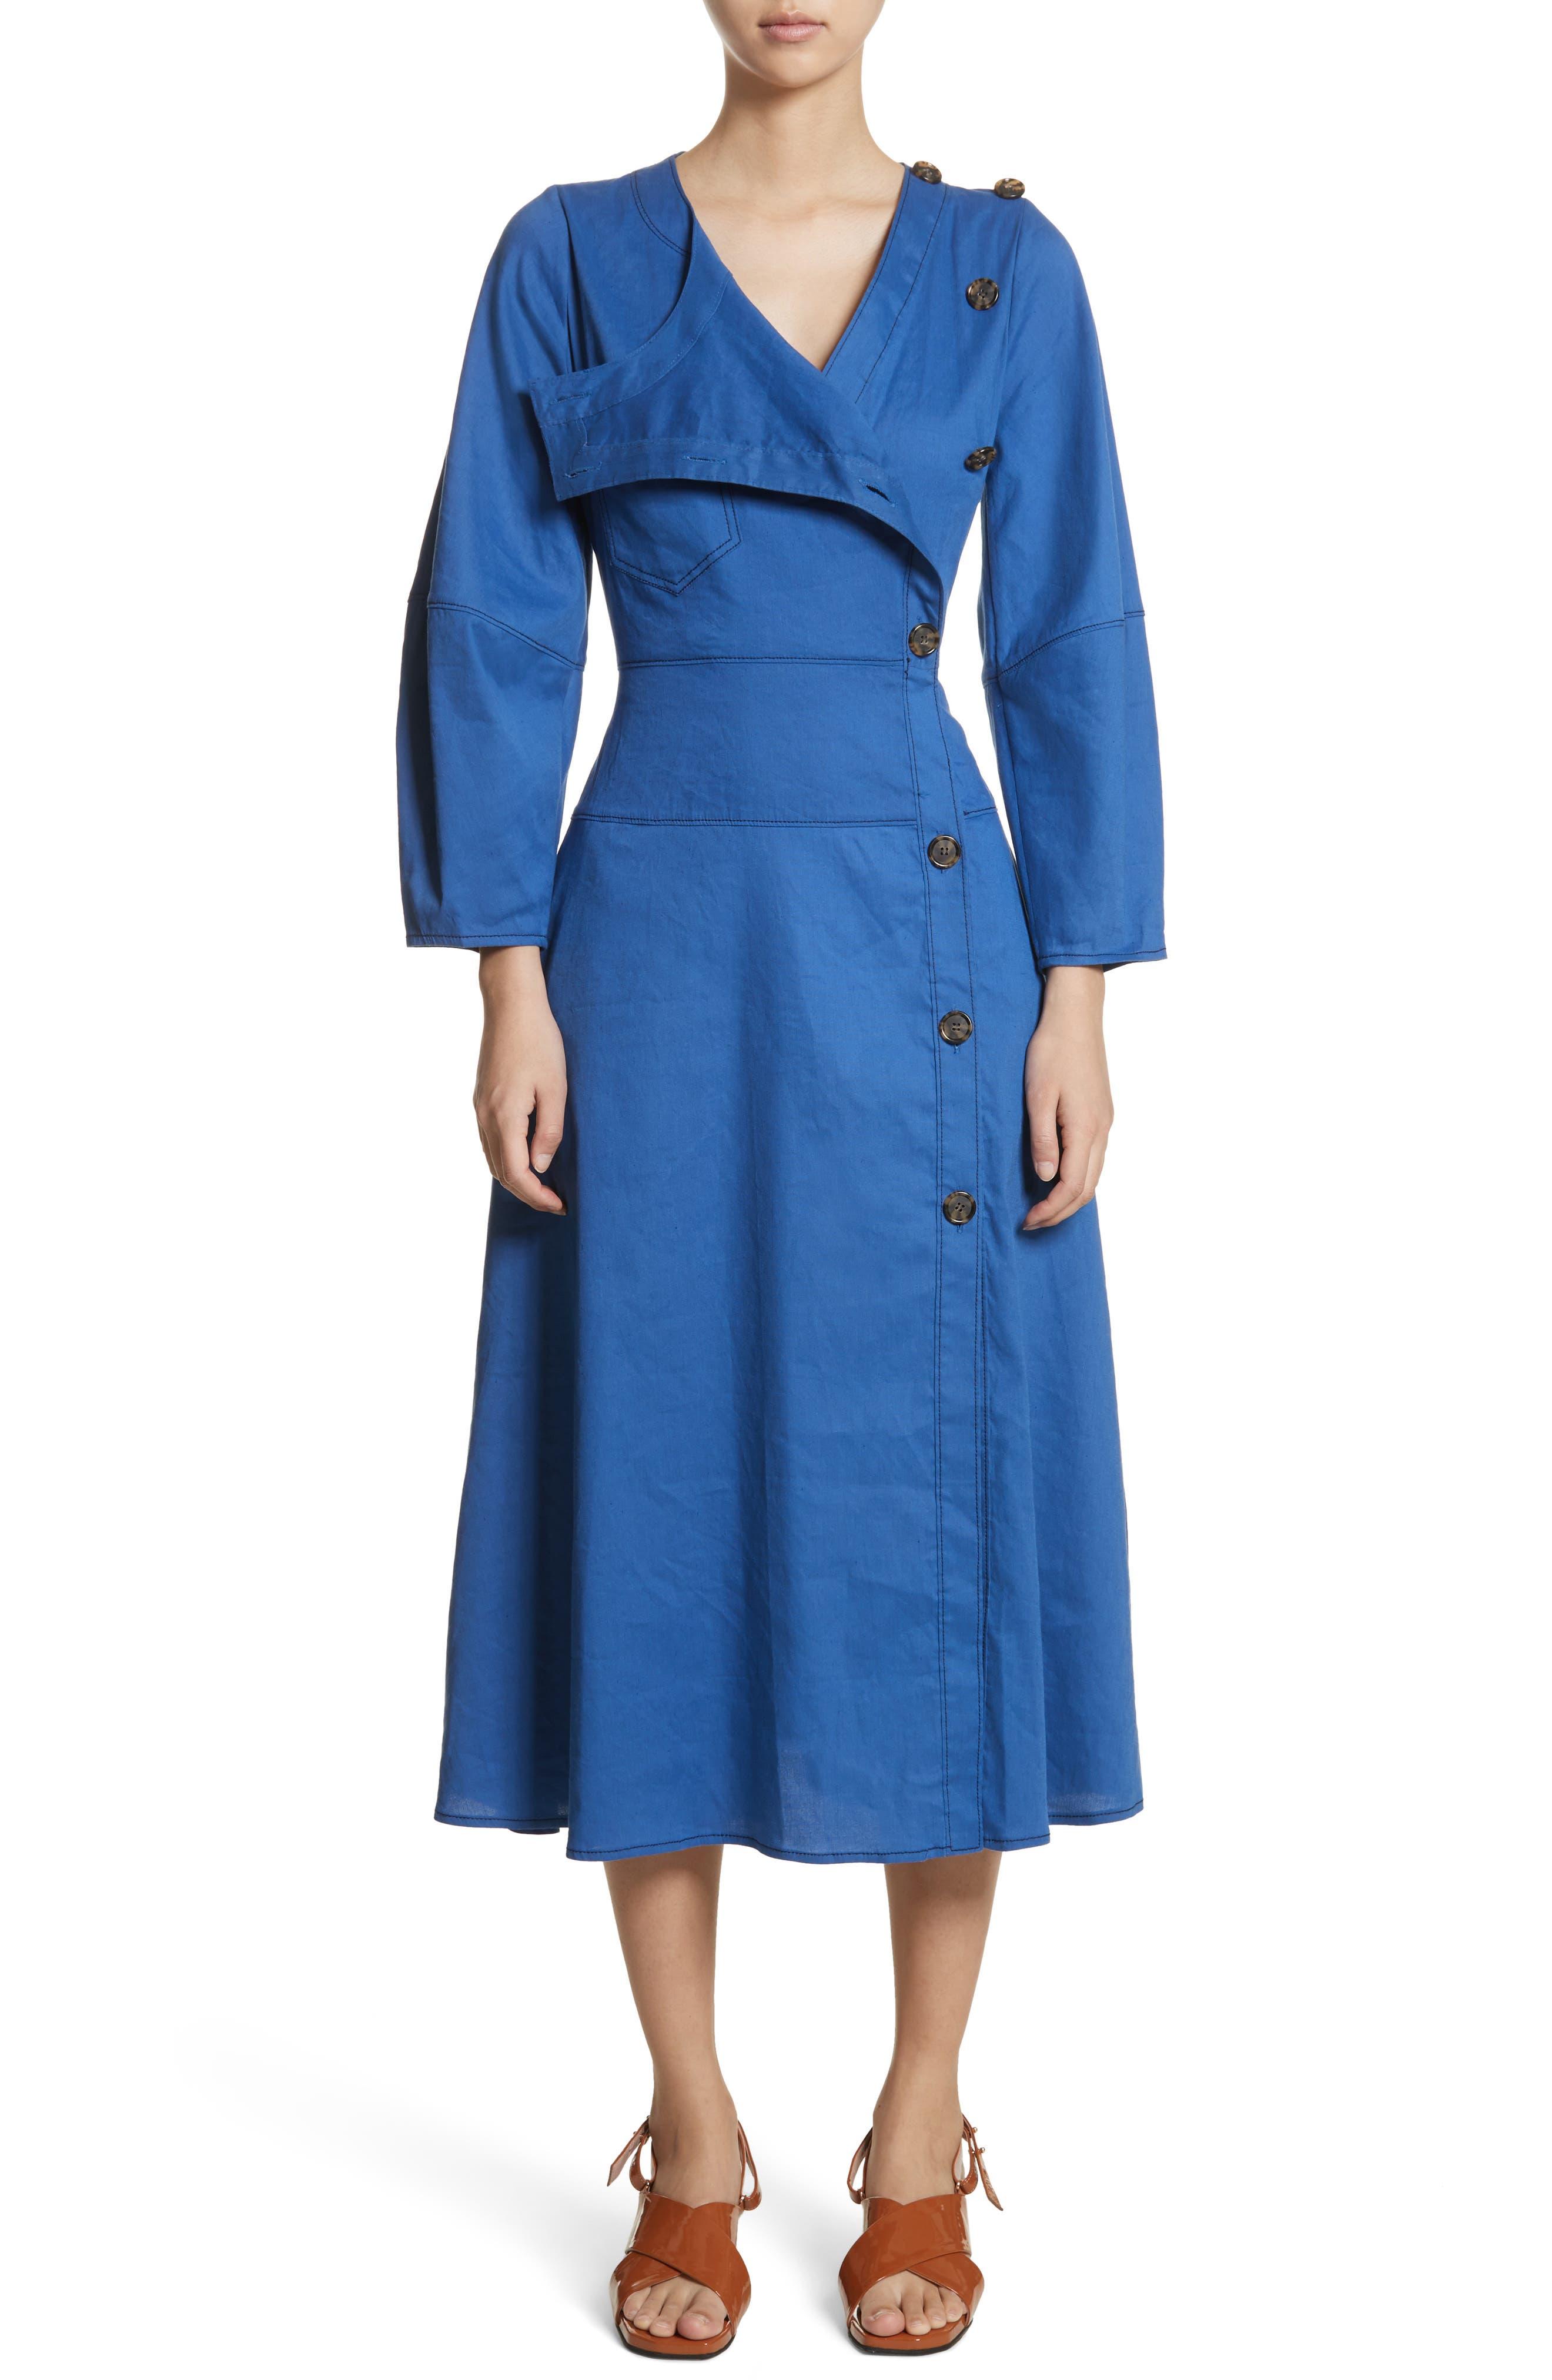 Michaela Linen Dress,                         Main,                         color, Linen Blue